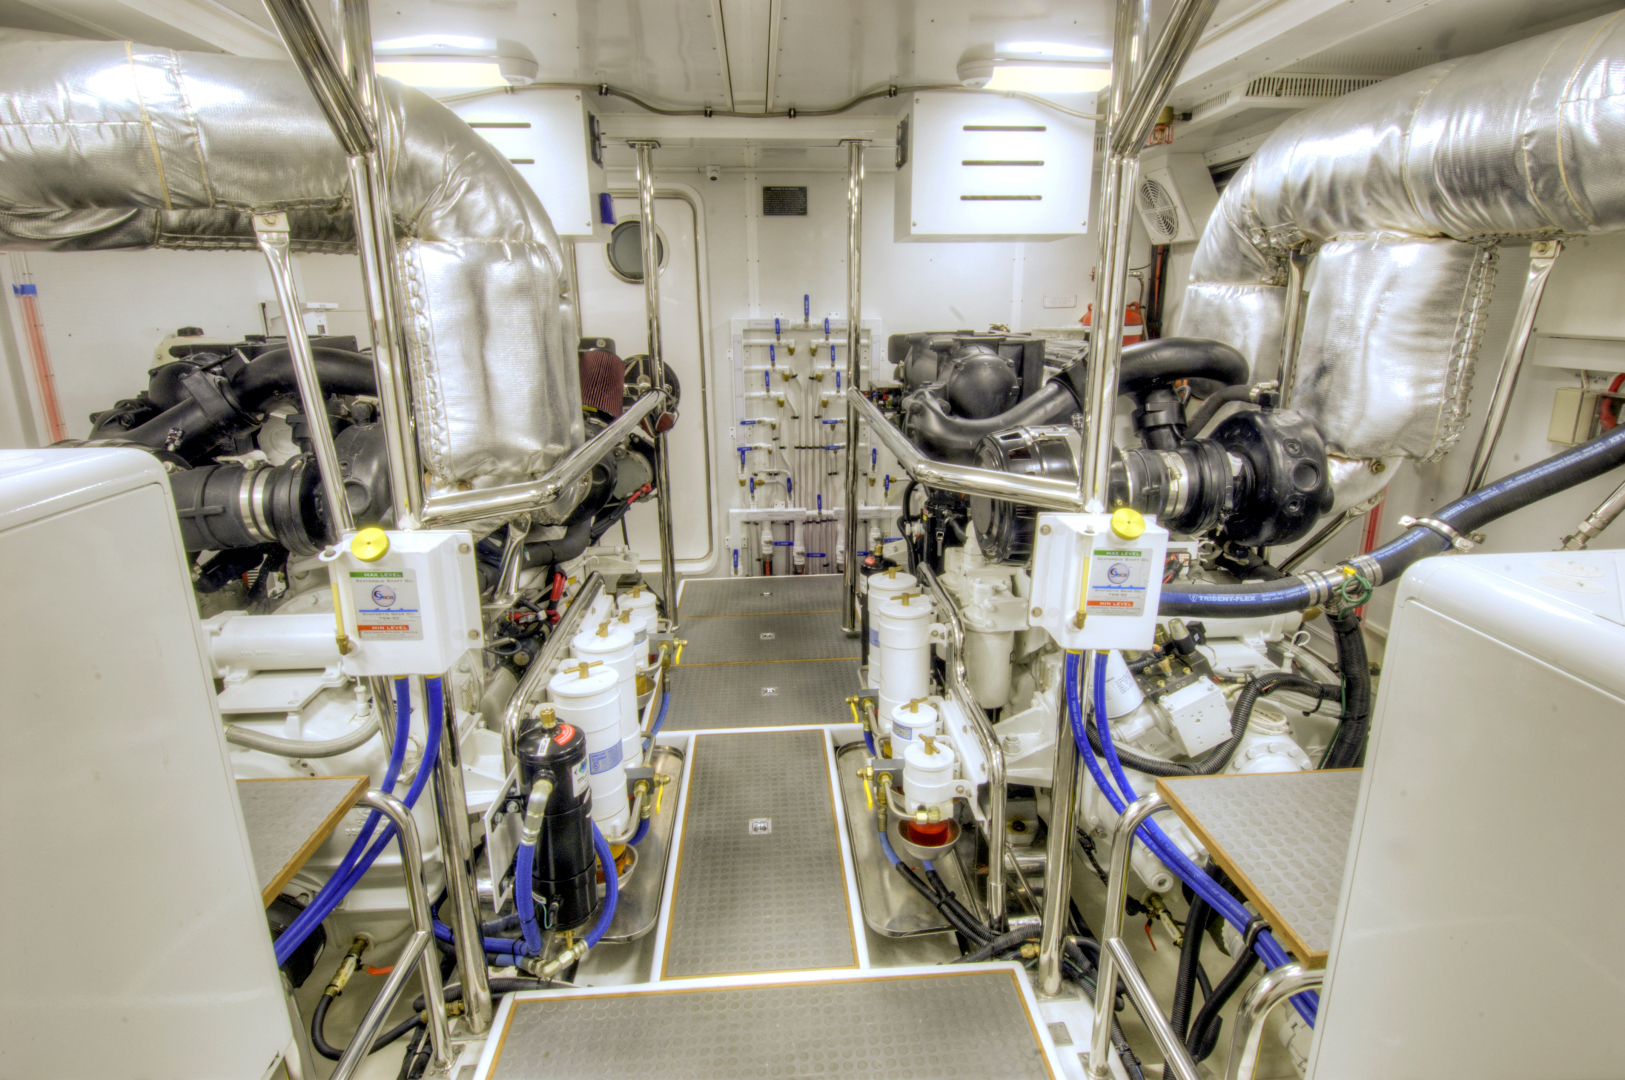 Offshore Yachts-Motoryacht 2020 -United States-1117781   Thumbnail